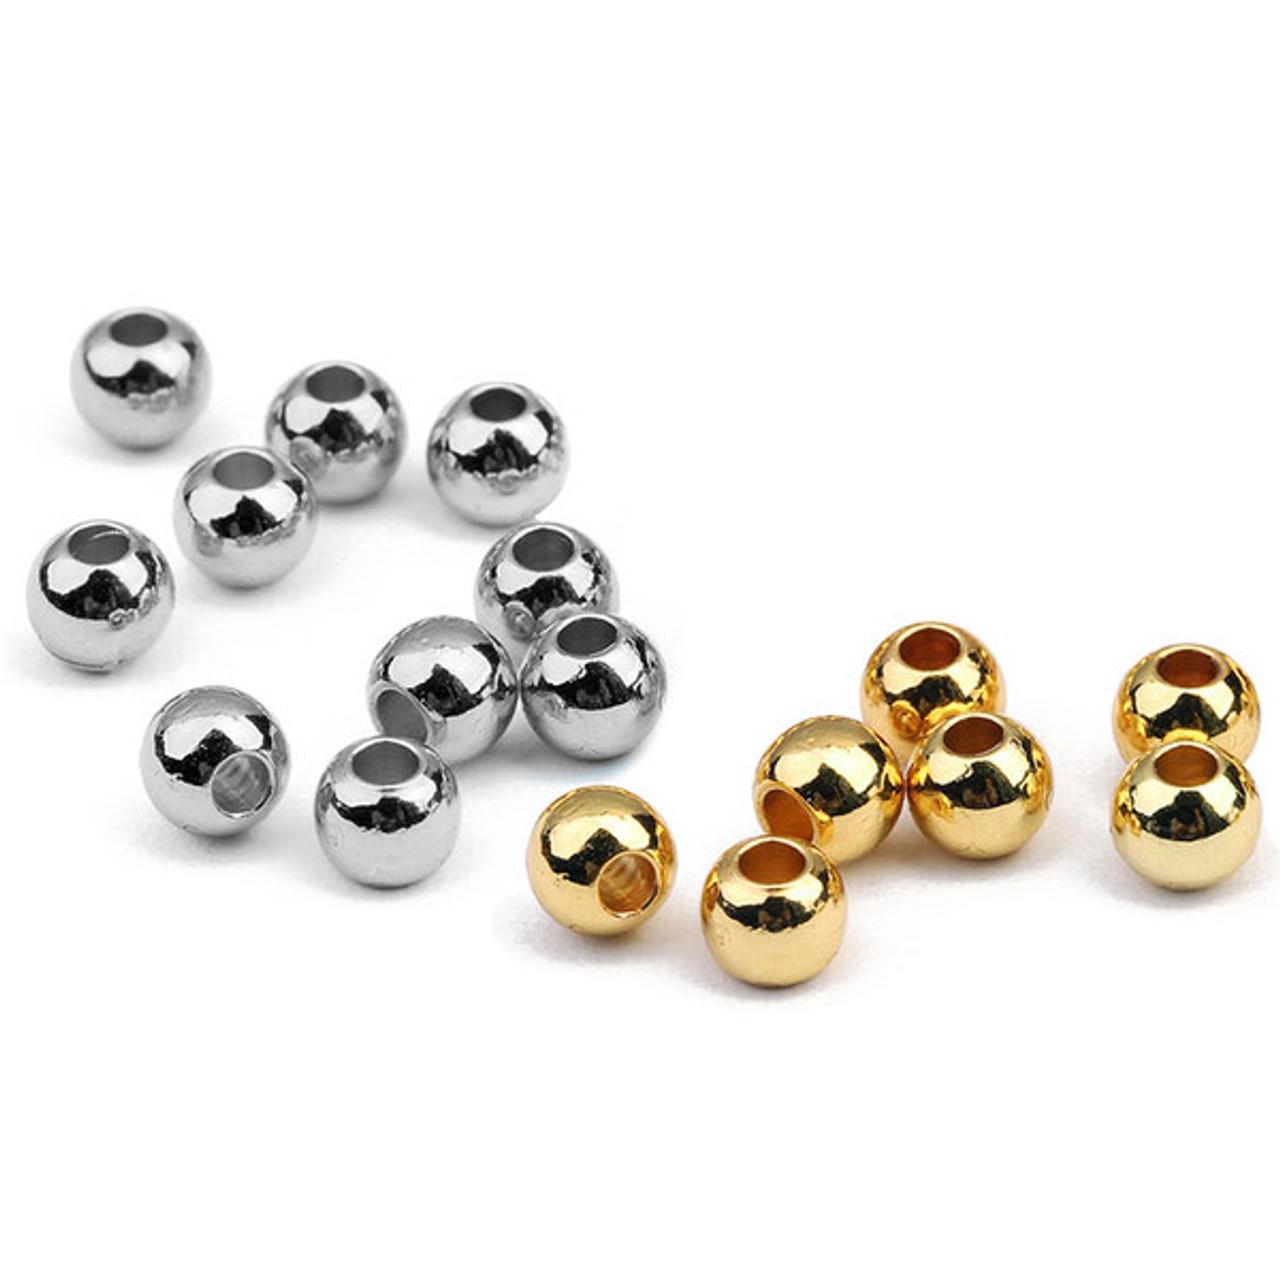 6mm 14 Karat Yellow Gold Round Bead Ball Stud Earrings